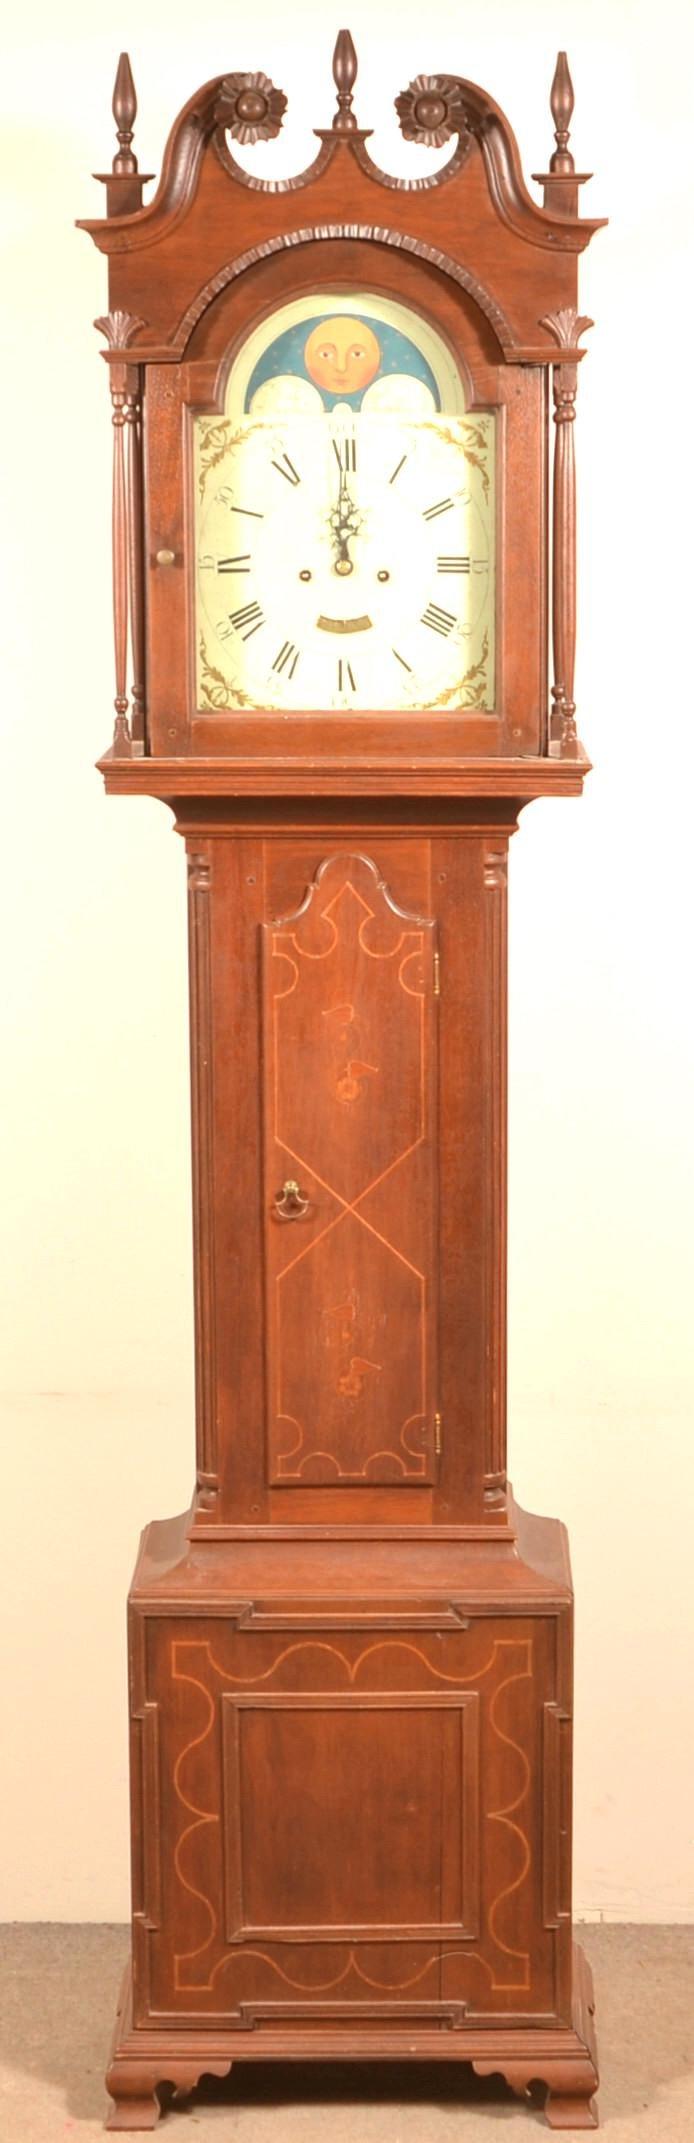 Pennsylvania Chippendale Inlaid Walnut Tall Case Clock.